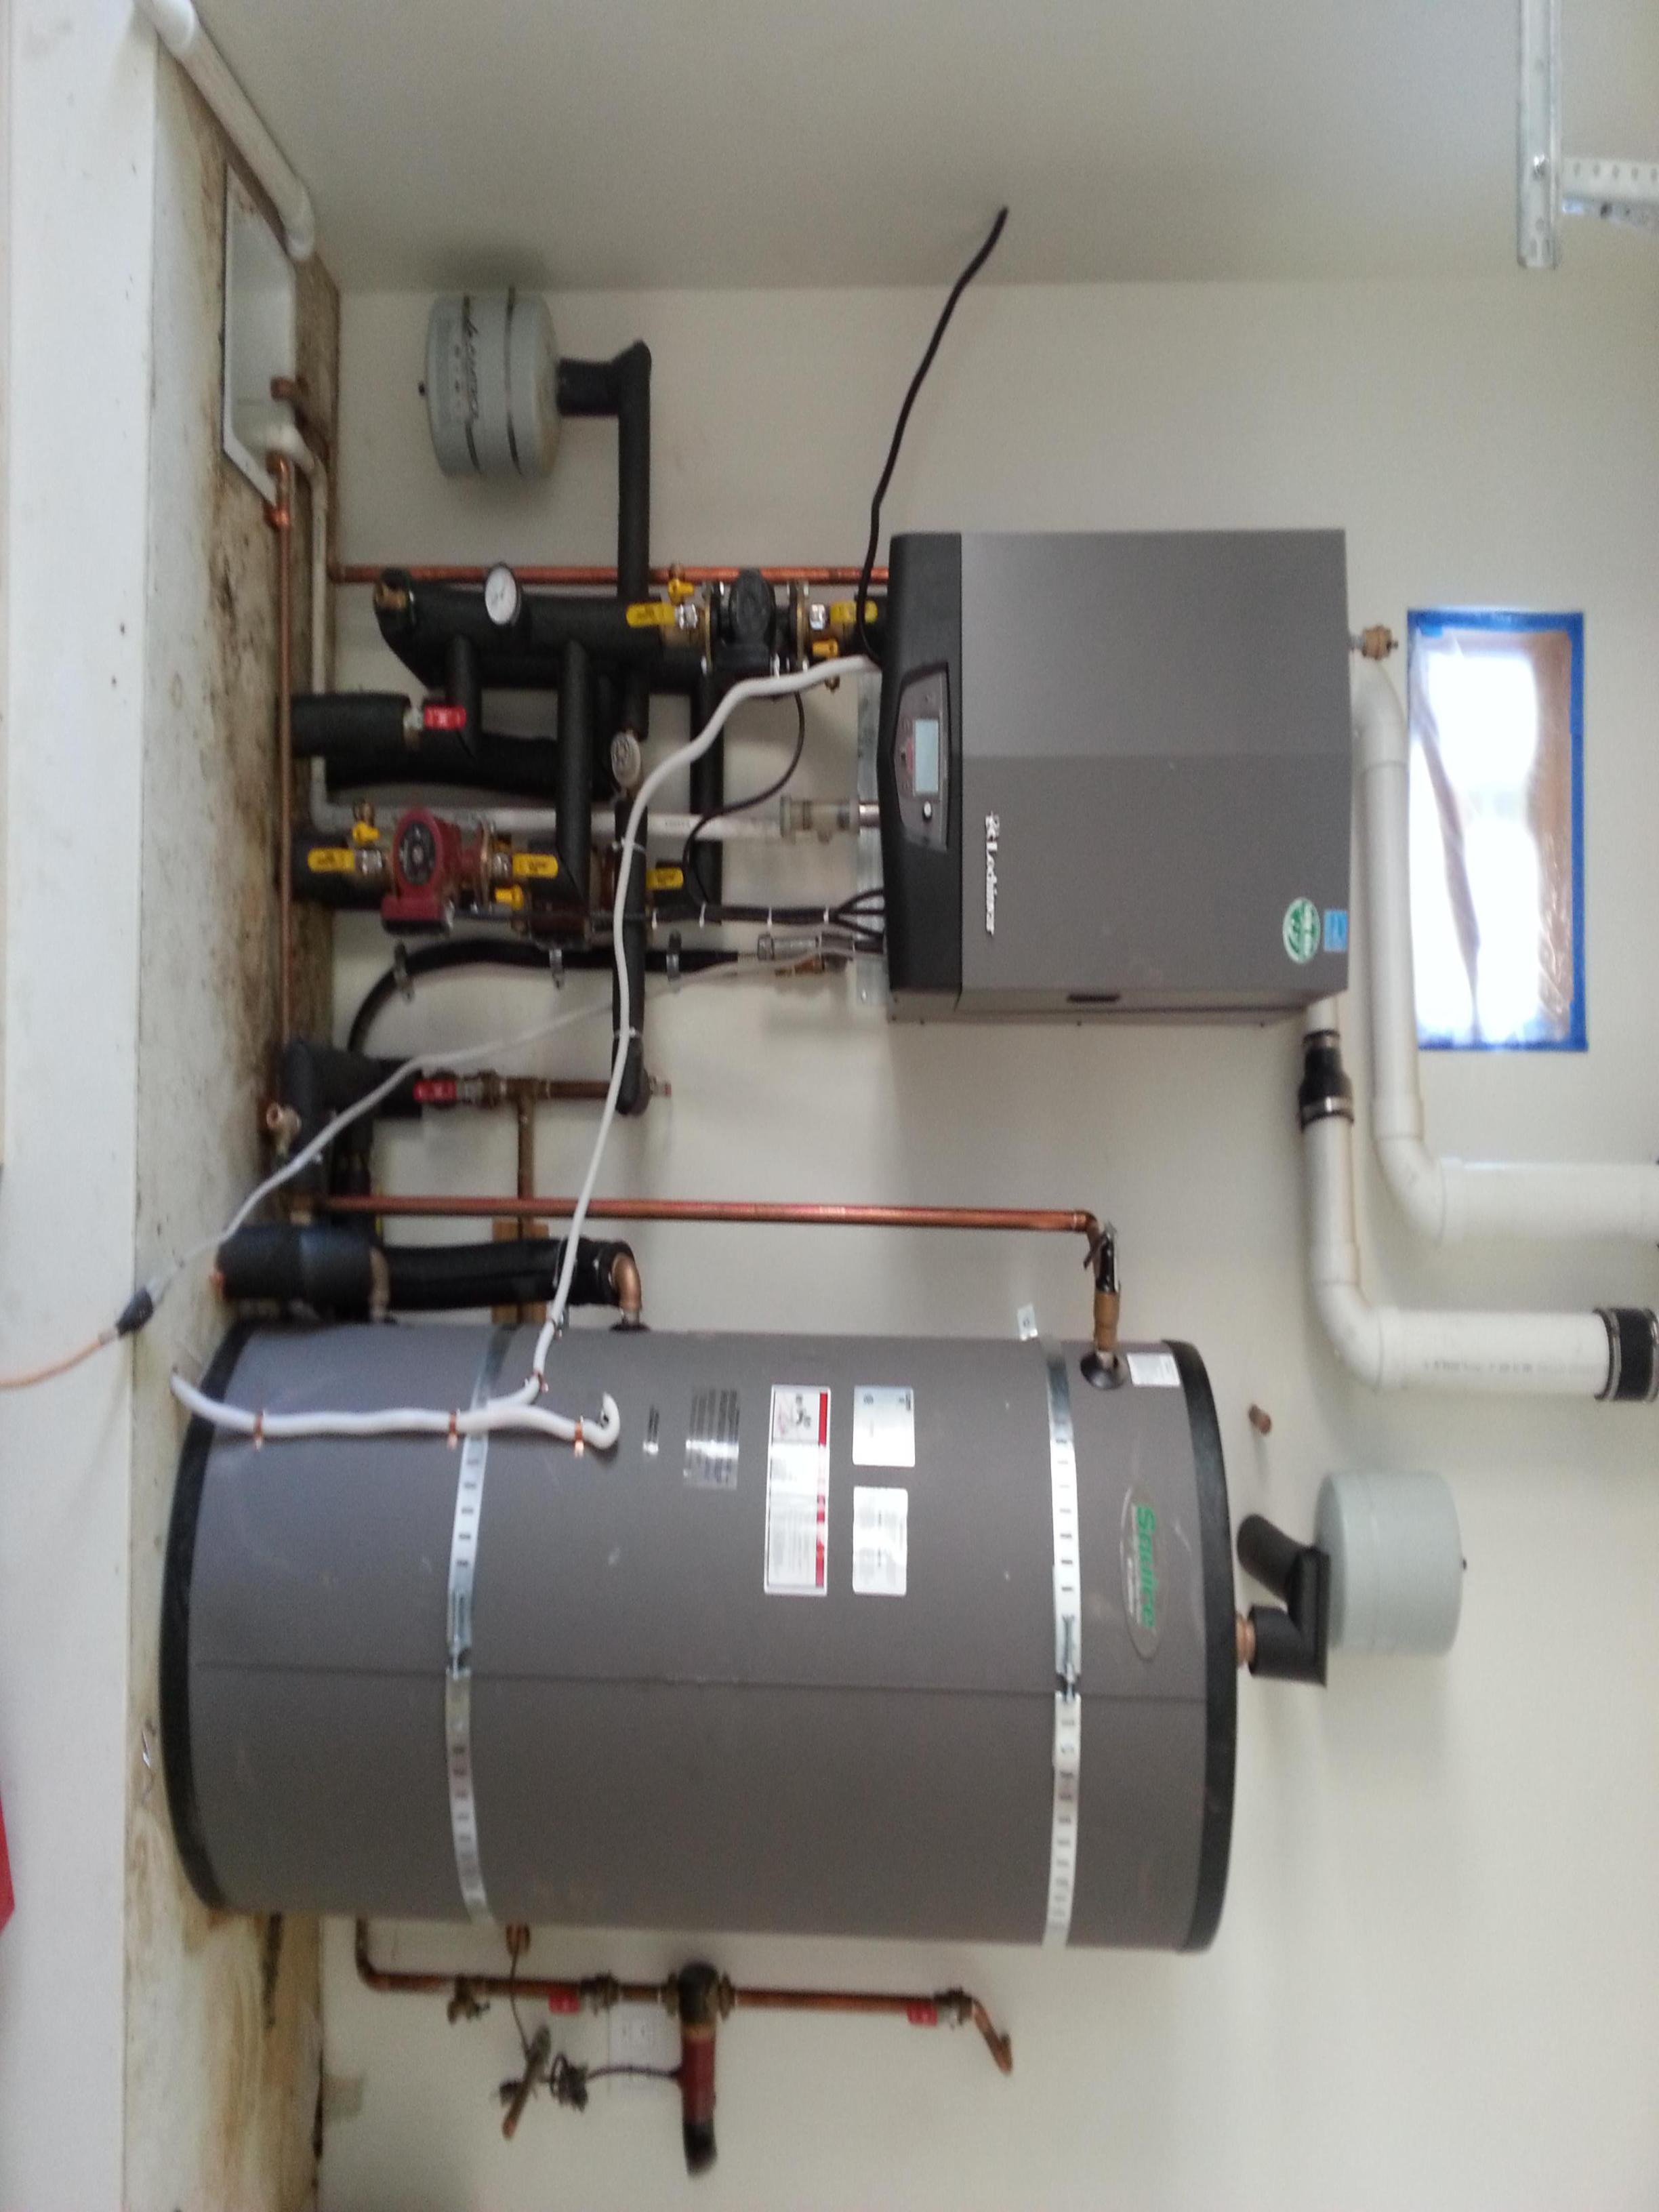 Schefer Radiant Hydronic Heat & Plumbing image 2